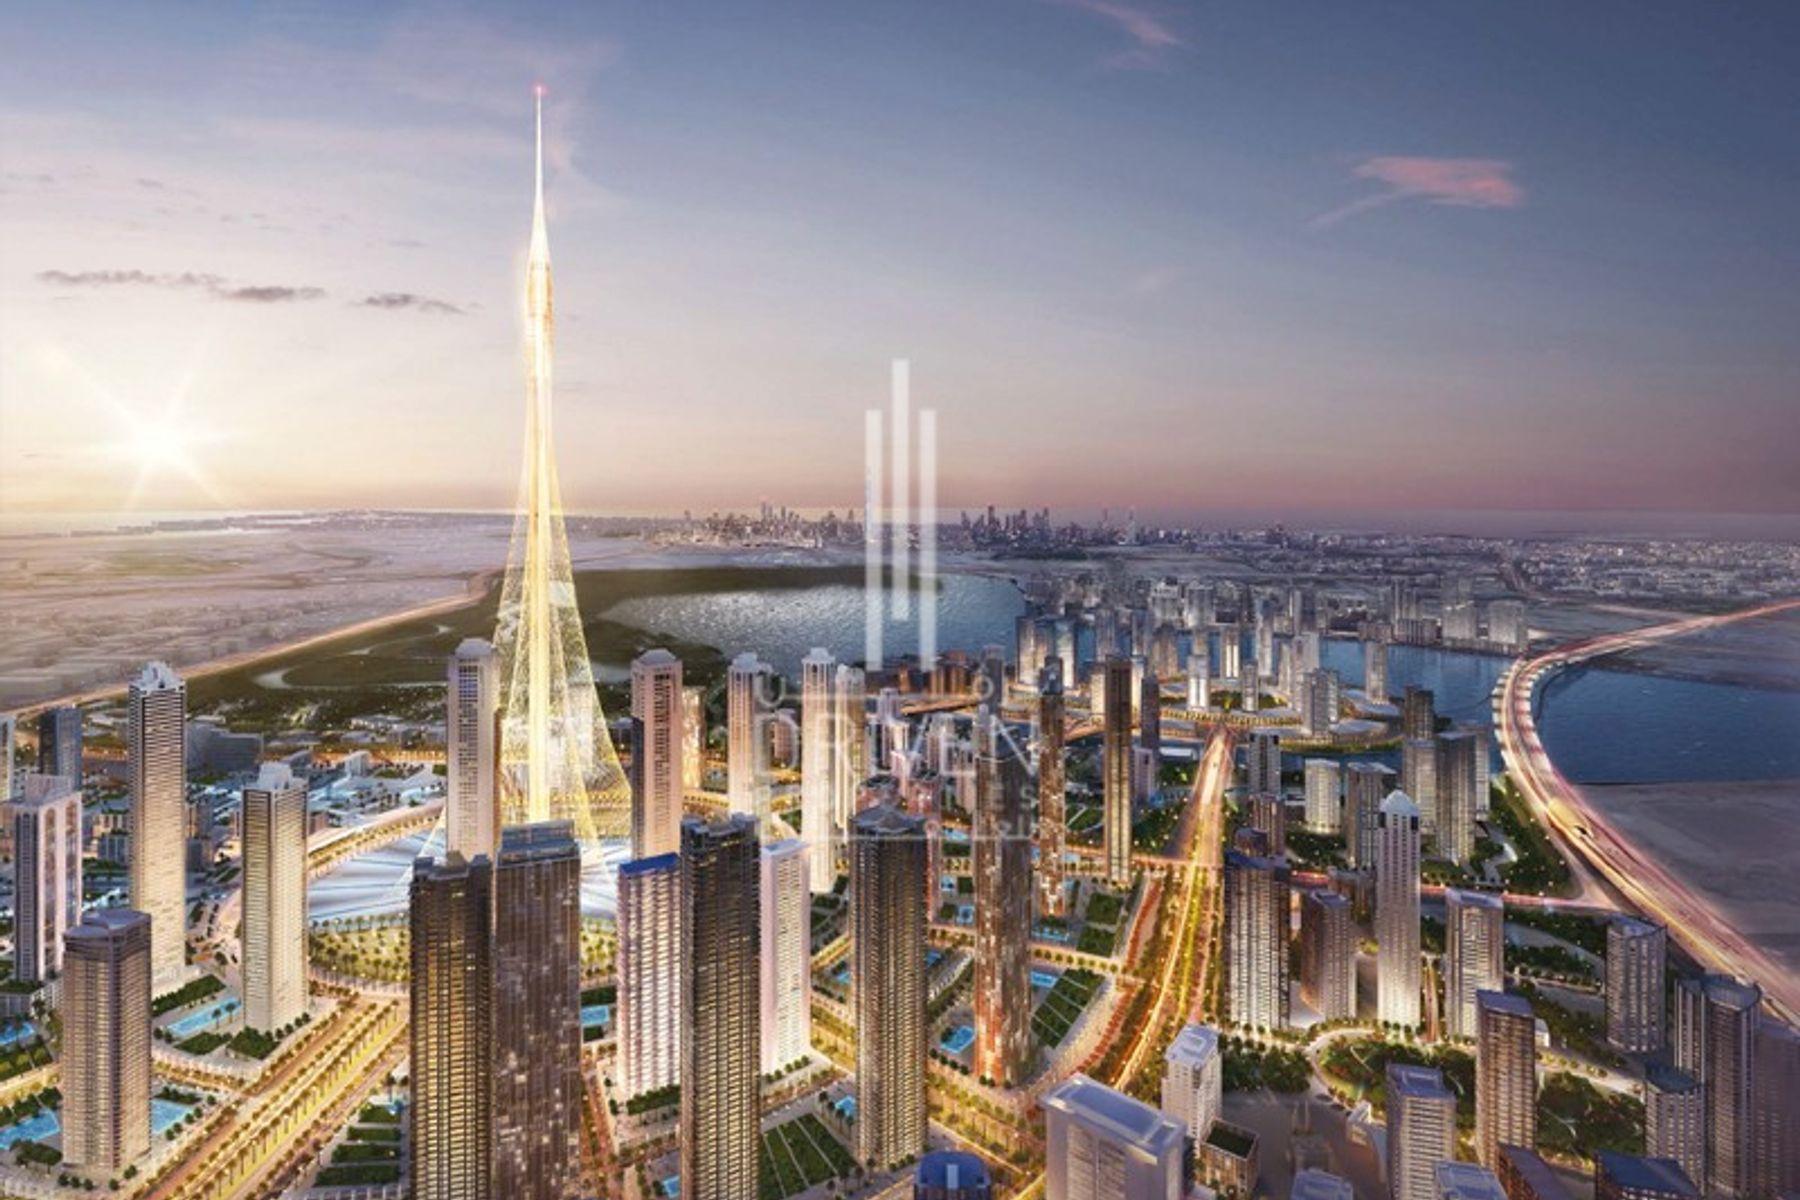 Apartment for Sale in Dubai Creek Residence Tower 2 South, Dubai Creek Harbour